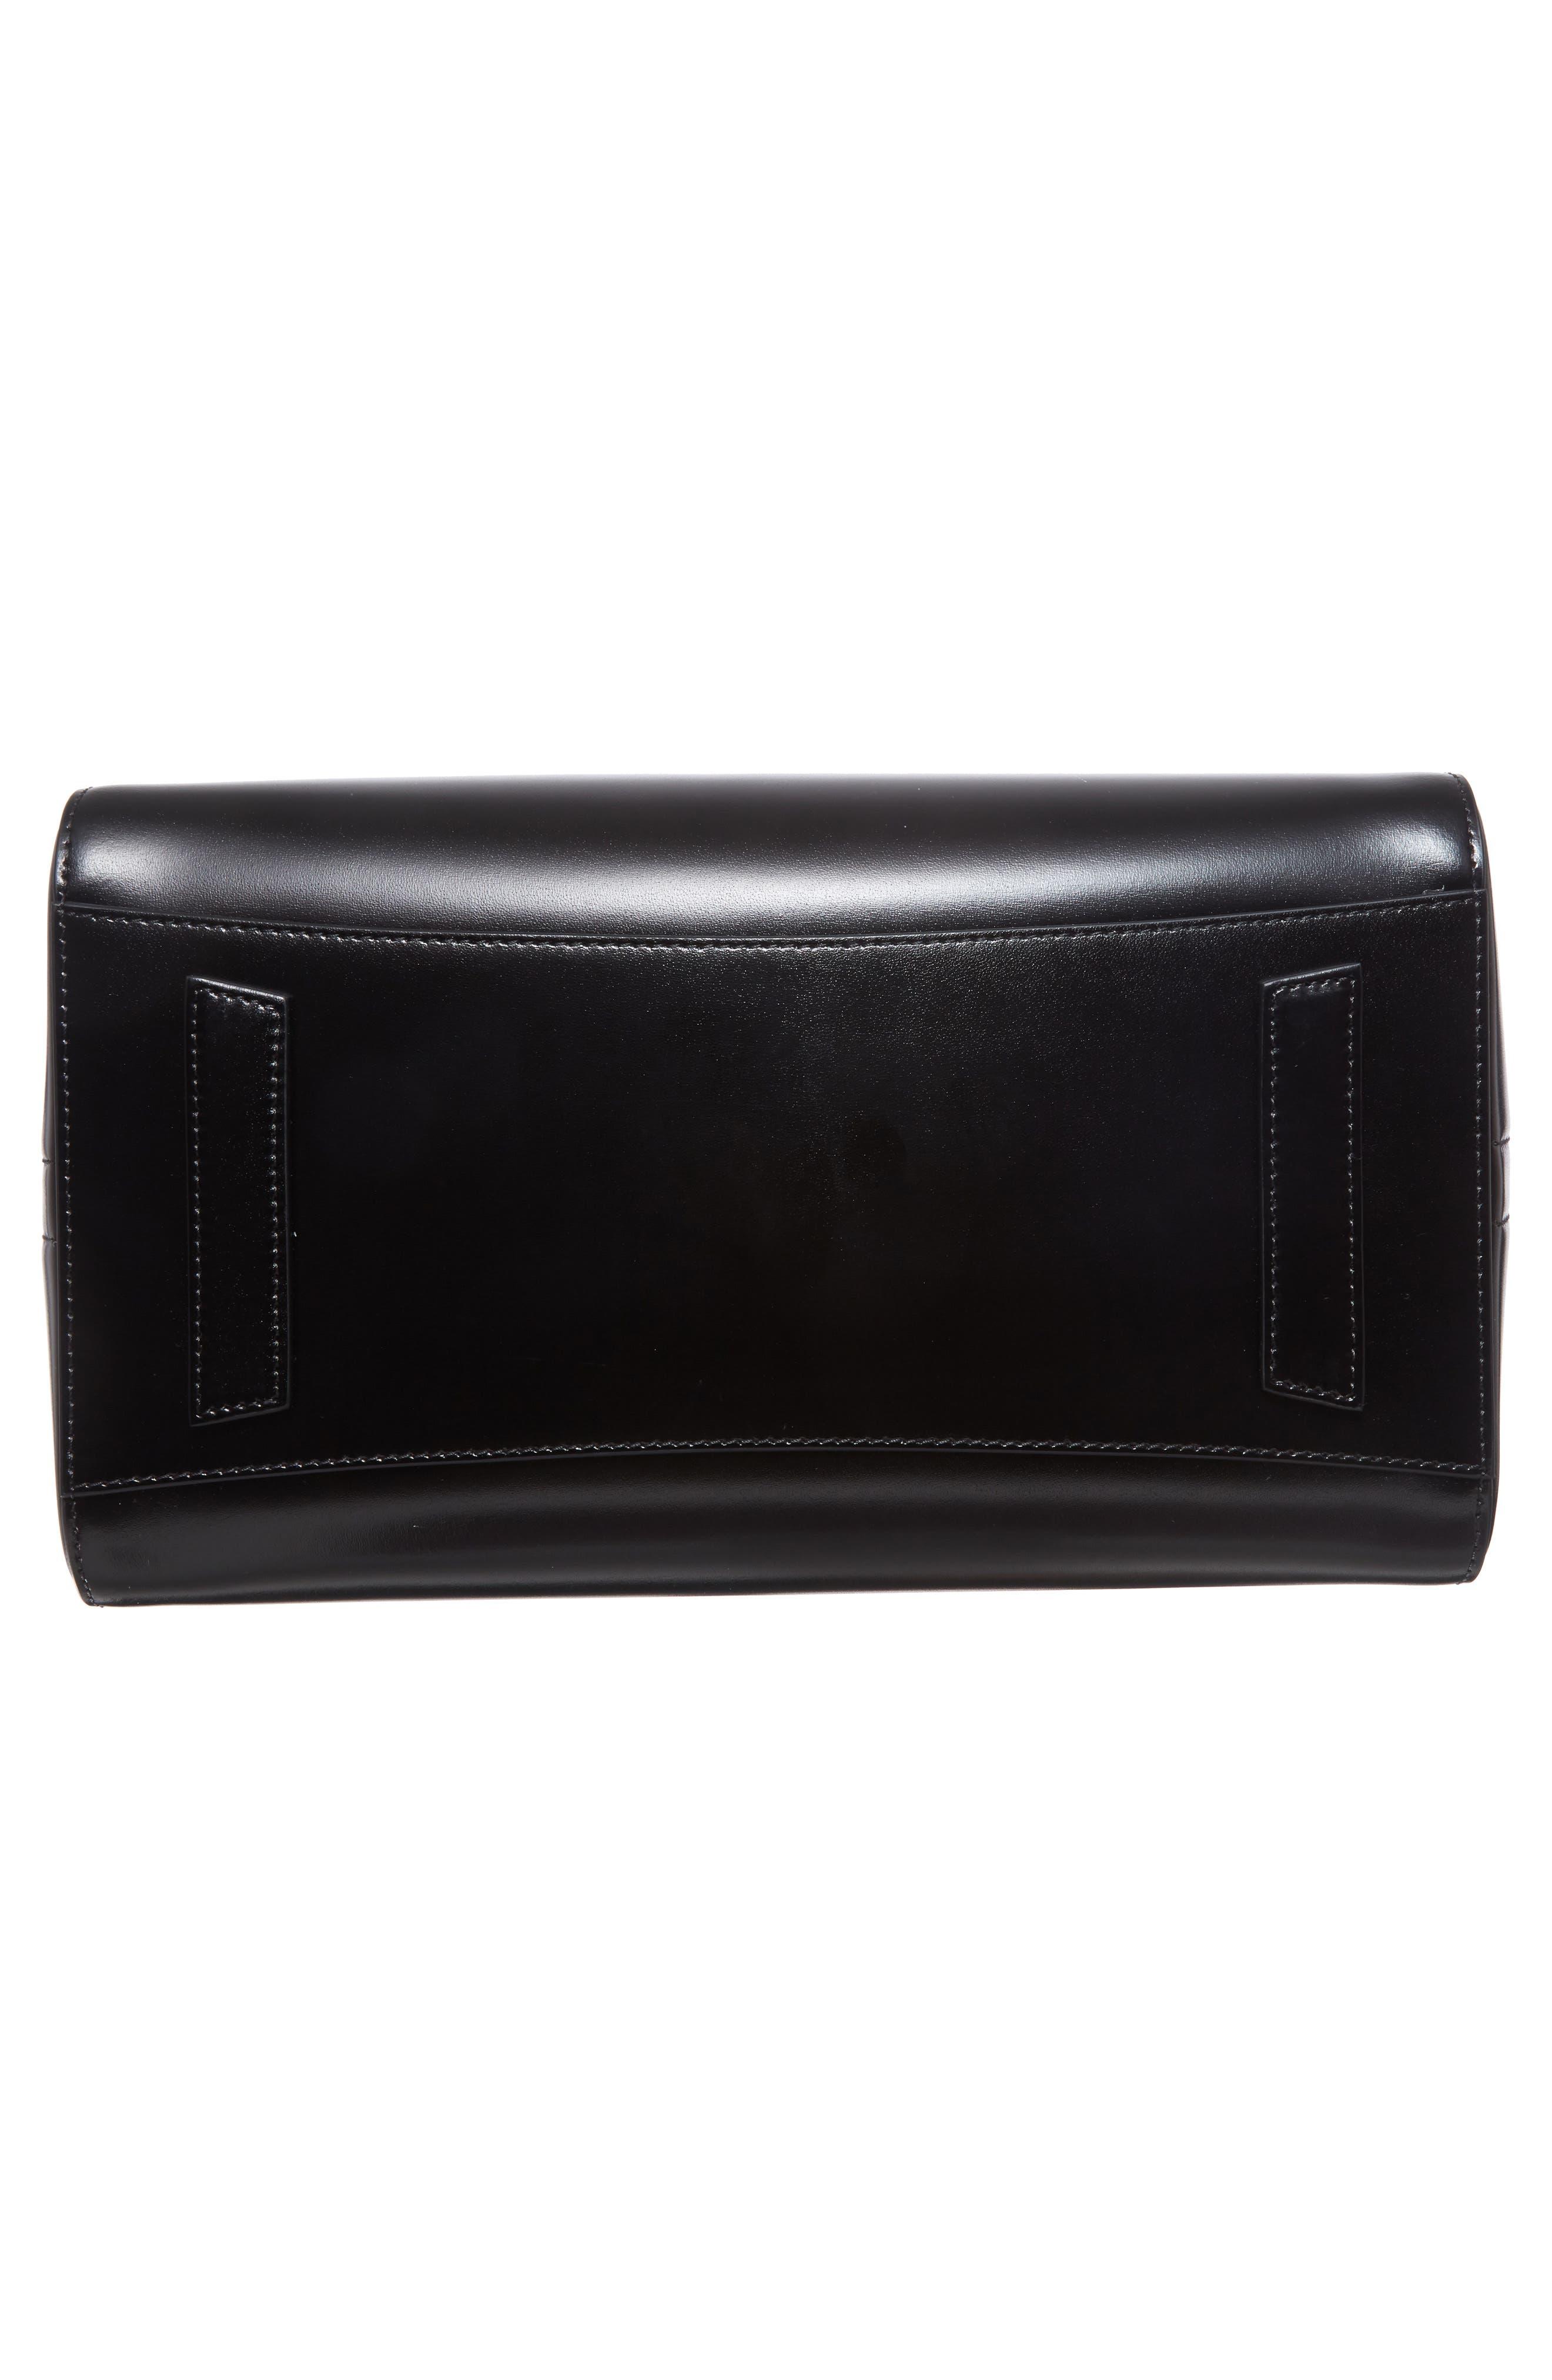 Medium Antigona Box Leather Satchel,                             Alternate thumbnail 6, color,                             001